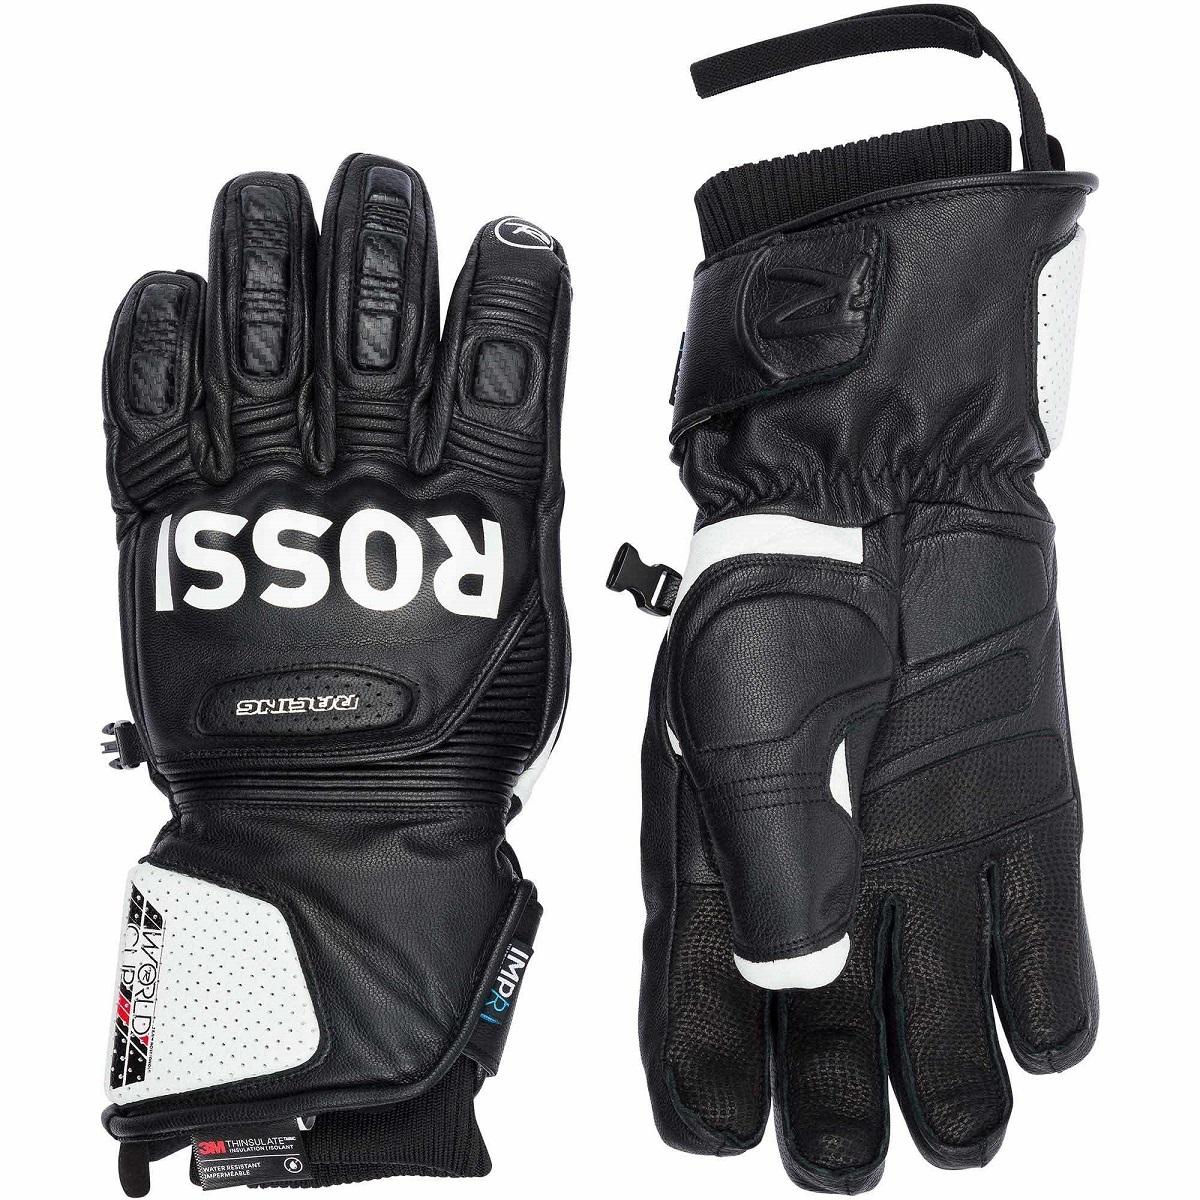 c10371fb1ce Lyžařské rukavice Rossignol WC Pro Race LTH IMPR G